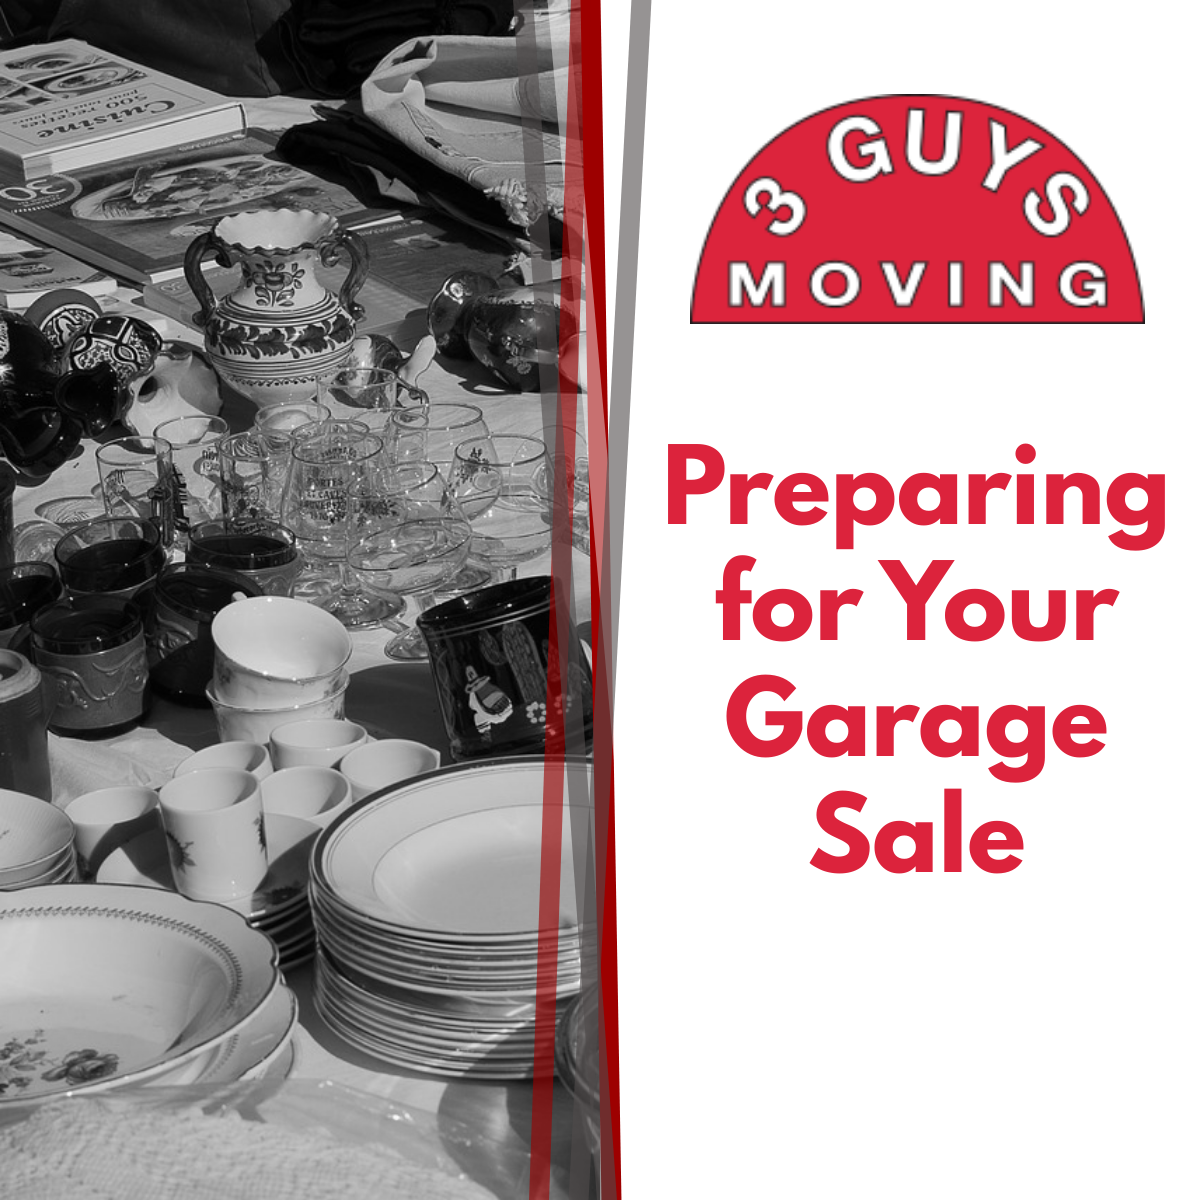 Preparing for Your Garage Sale - Preparing for Your Garage Sale